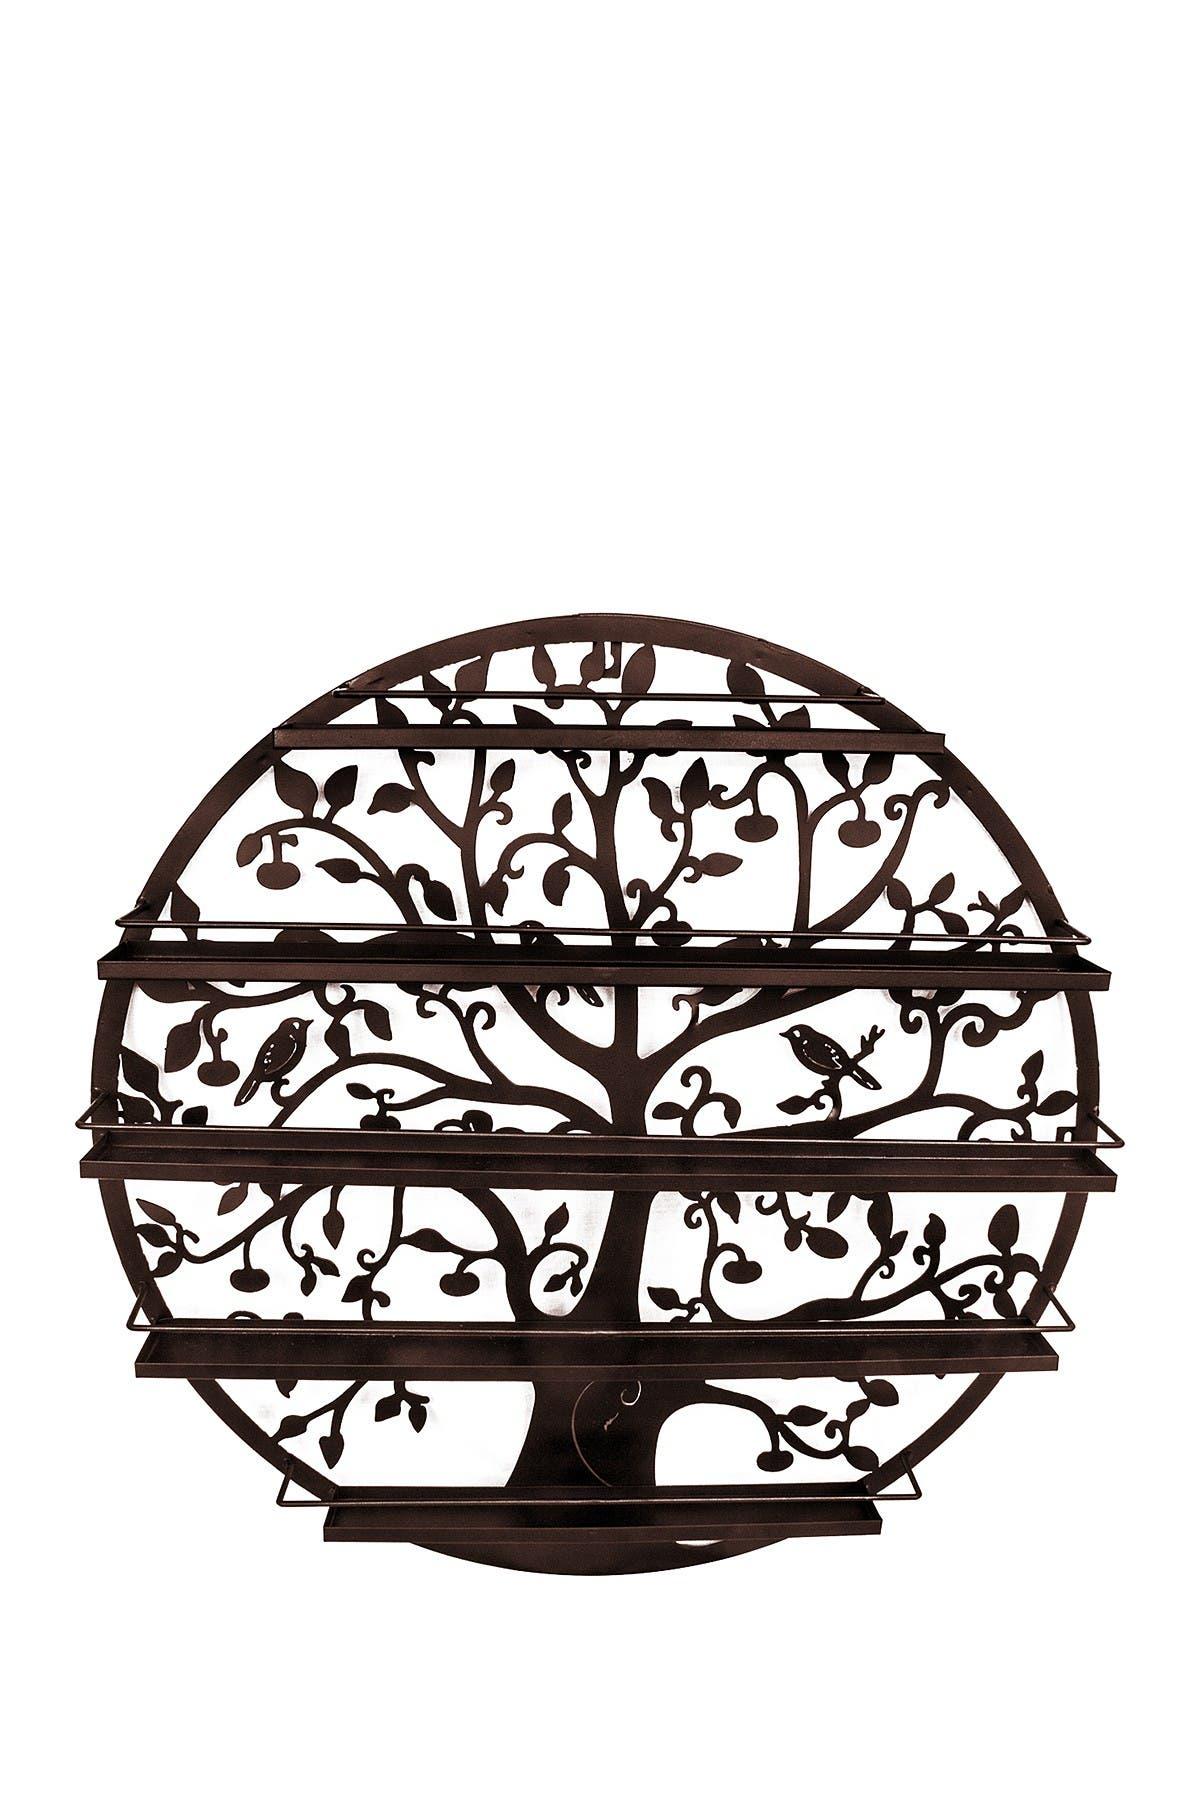 Image of Sorbus Bronze Round 5 Tier Tree Silhouette Salon Nail Polish Rack/Wall Art Display